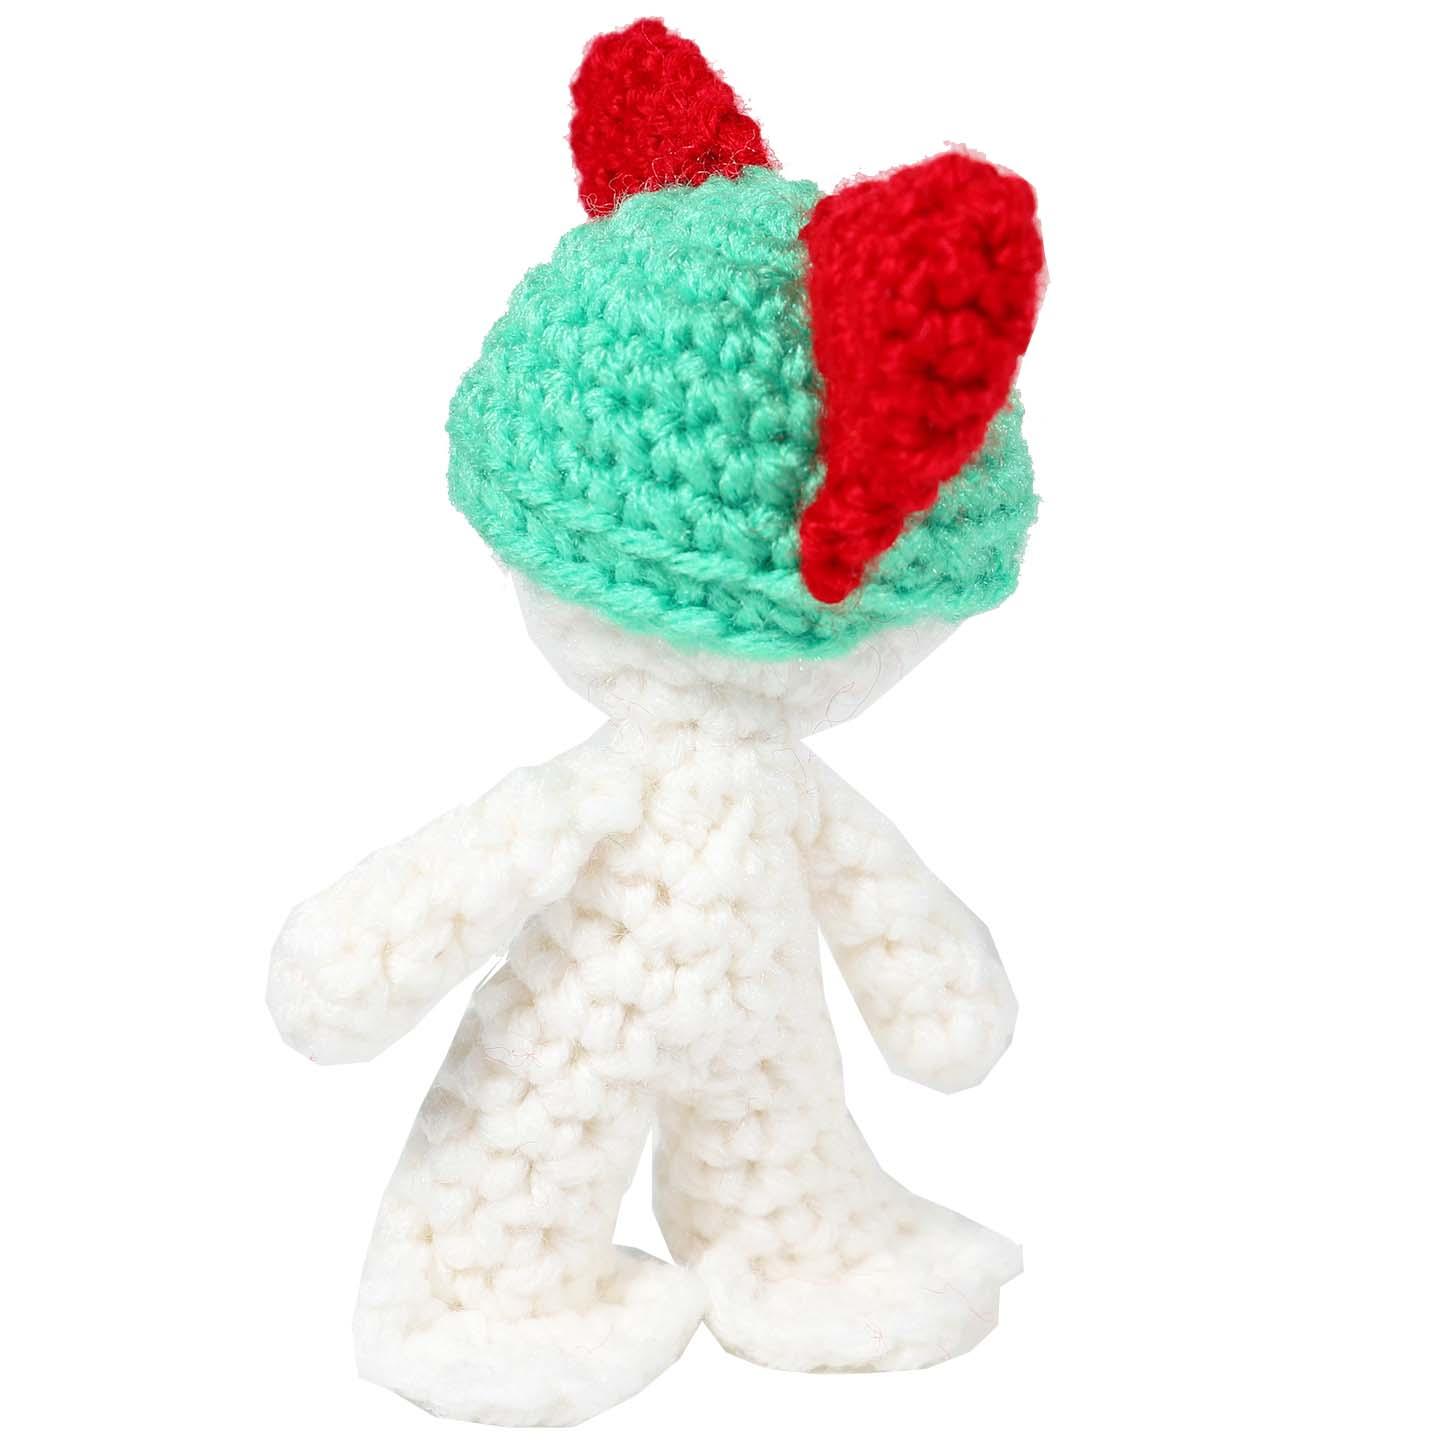 Ralts Crochet